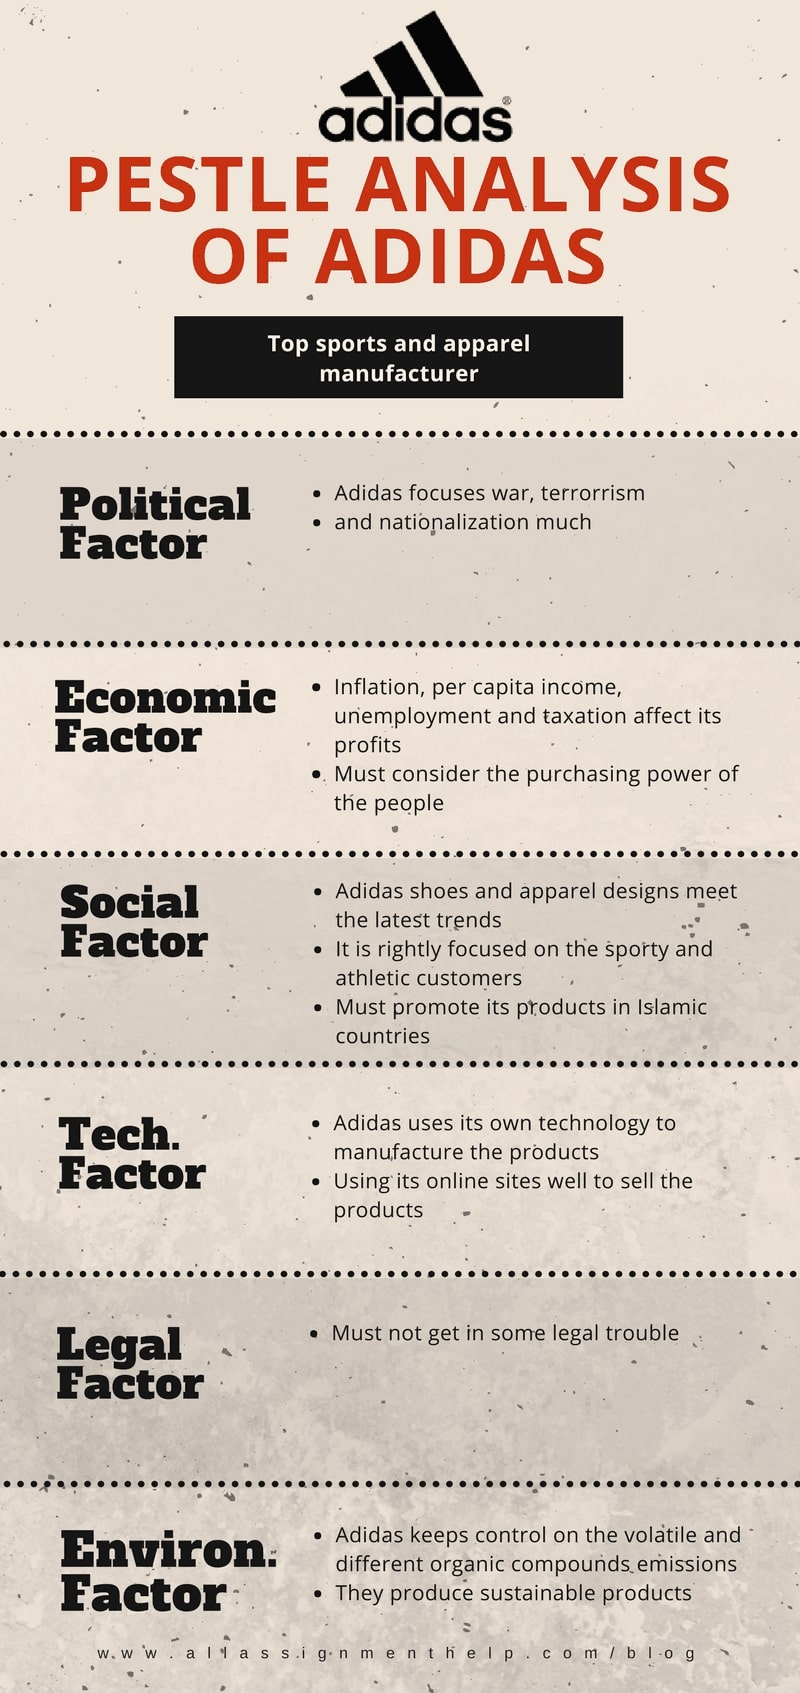 A PESTEL Analysis for Adidas